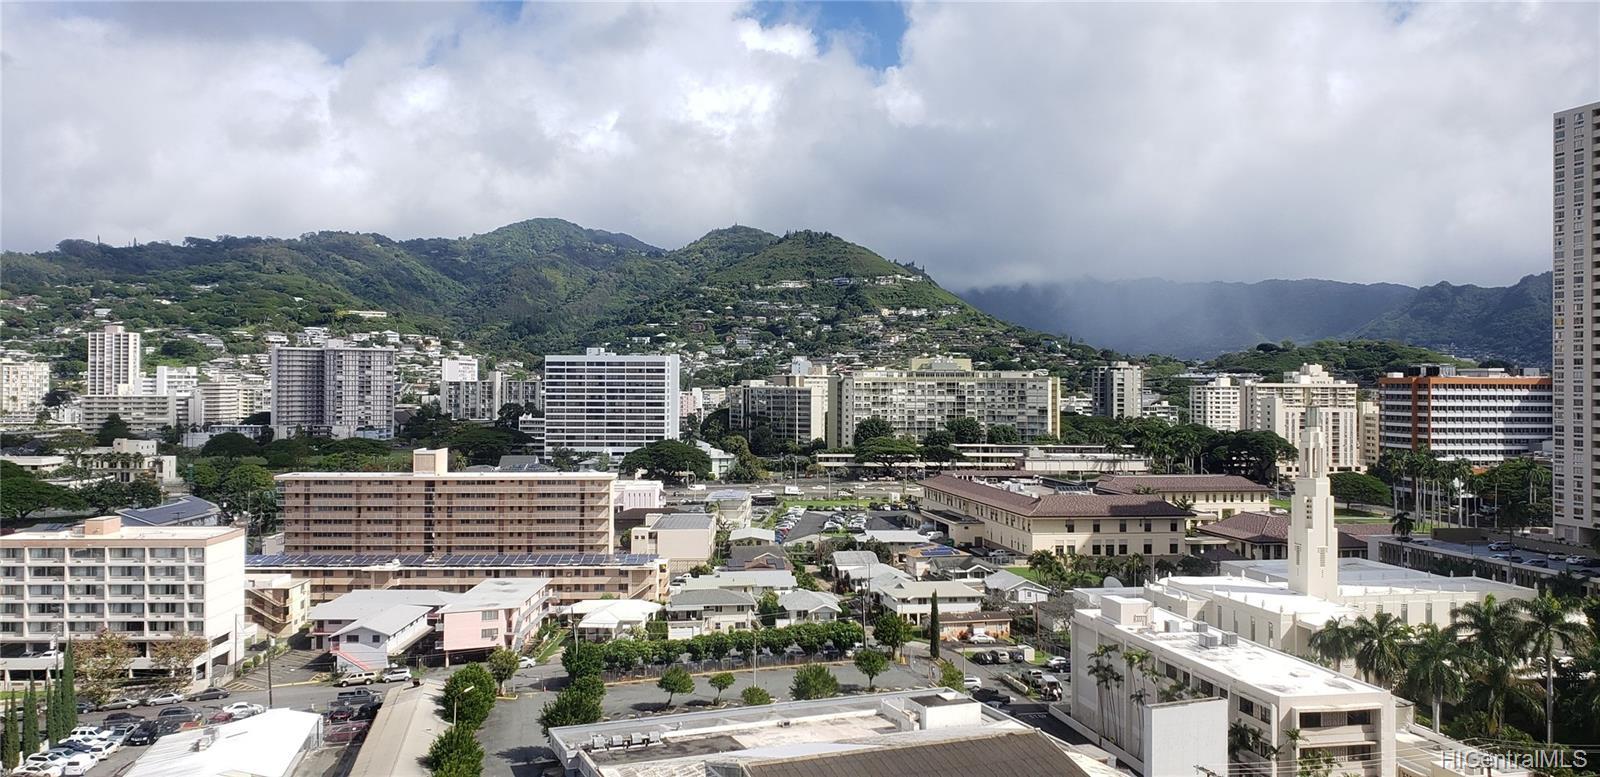 1448 Young St condo # 1802, Honolulu, Hawaii - photo 19 of 22